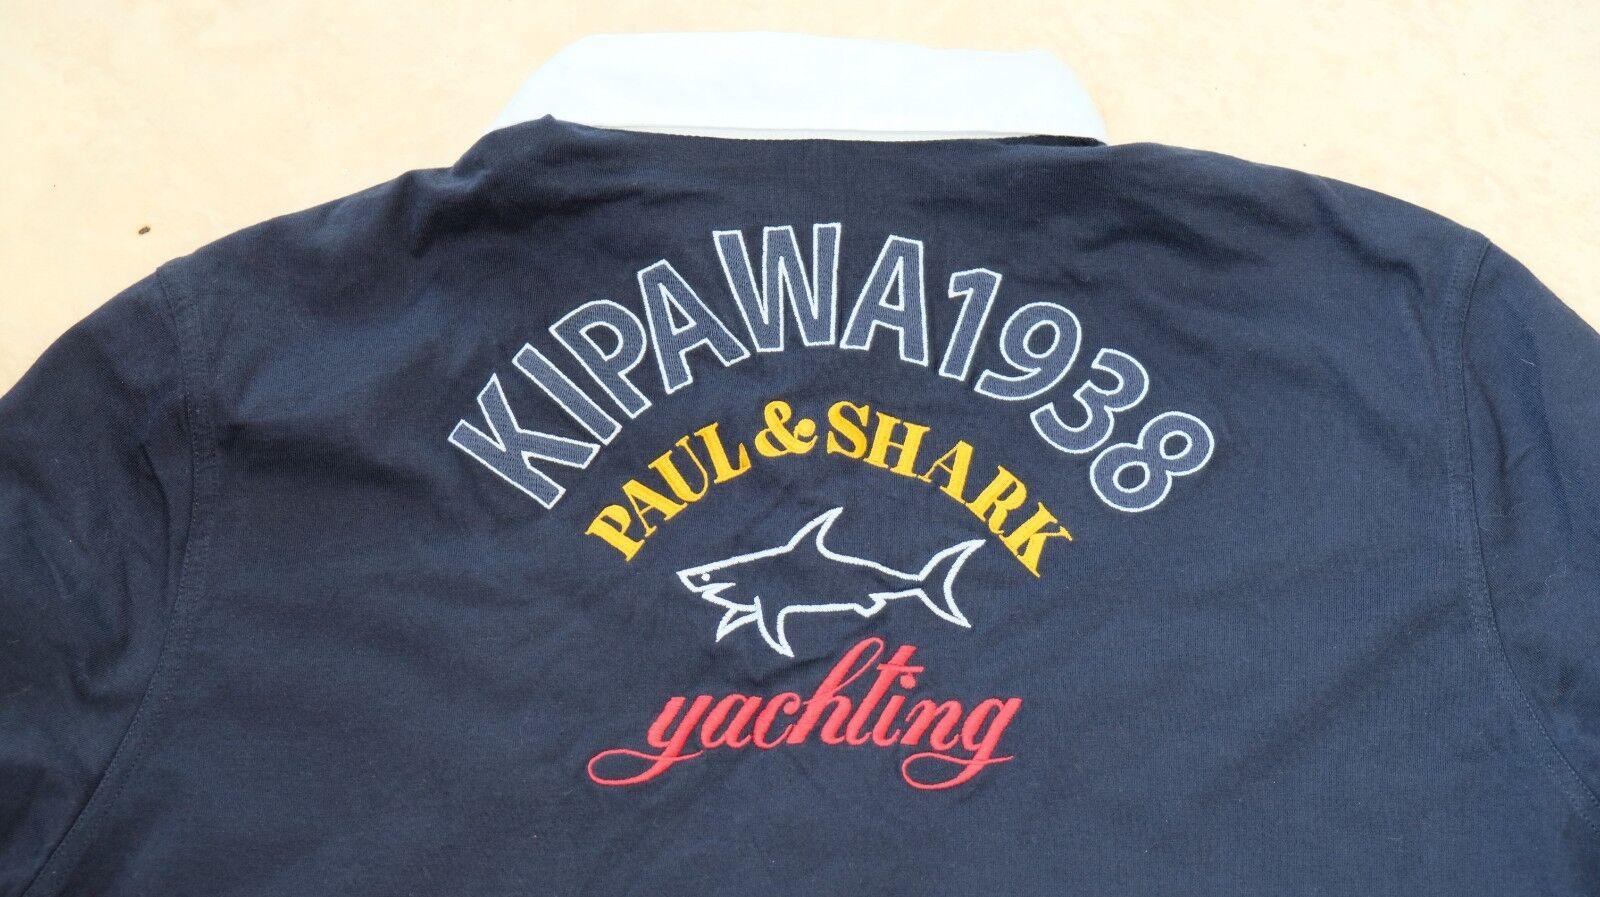 Paul & Shark Yachting sweatshirt polo shirt size XL Kipawa Kpw Oslo 1938